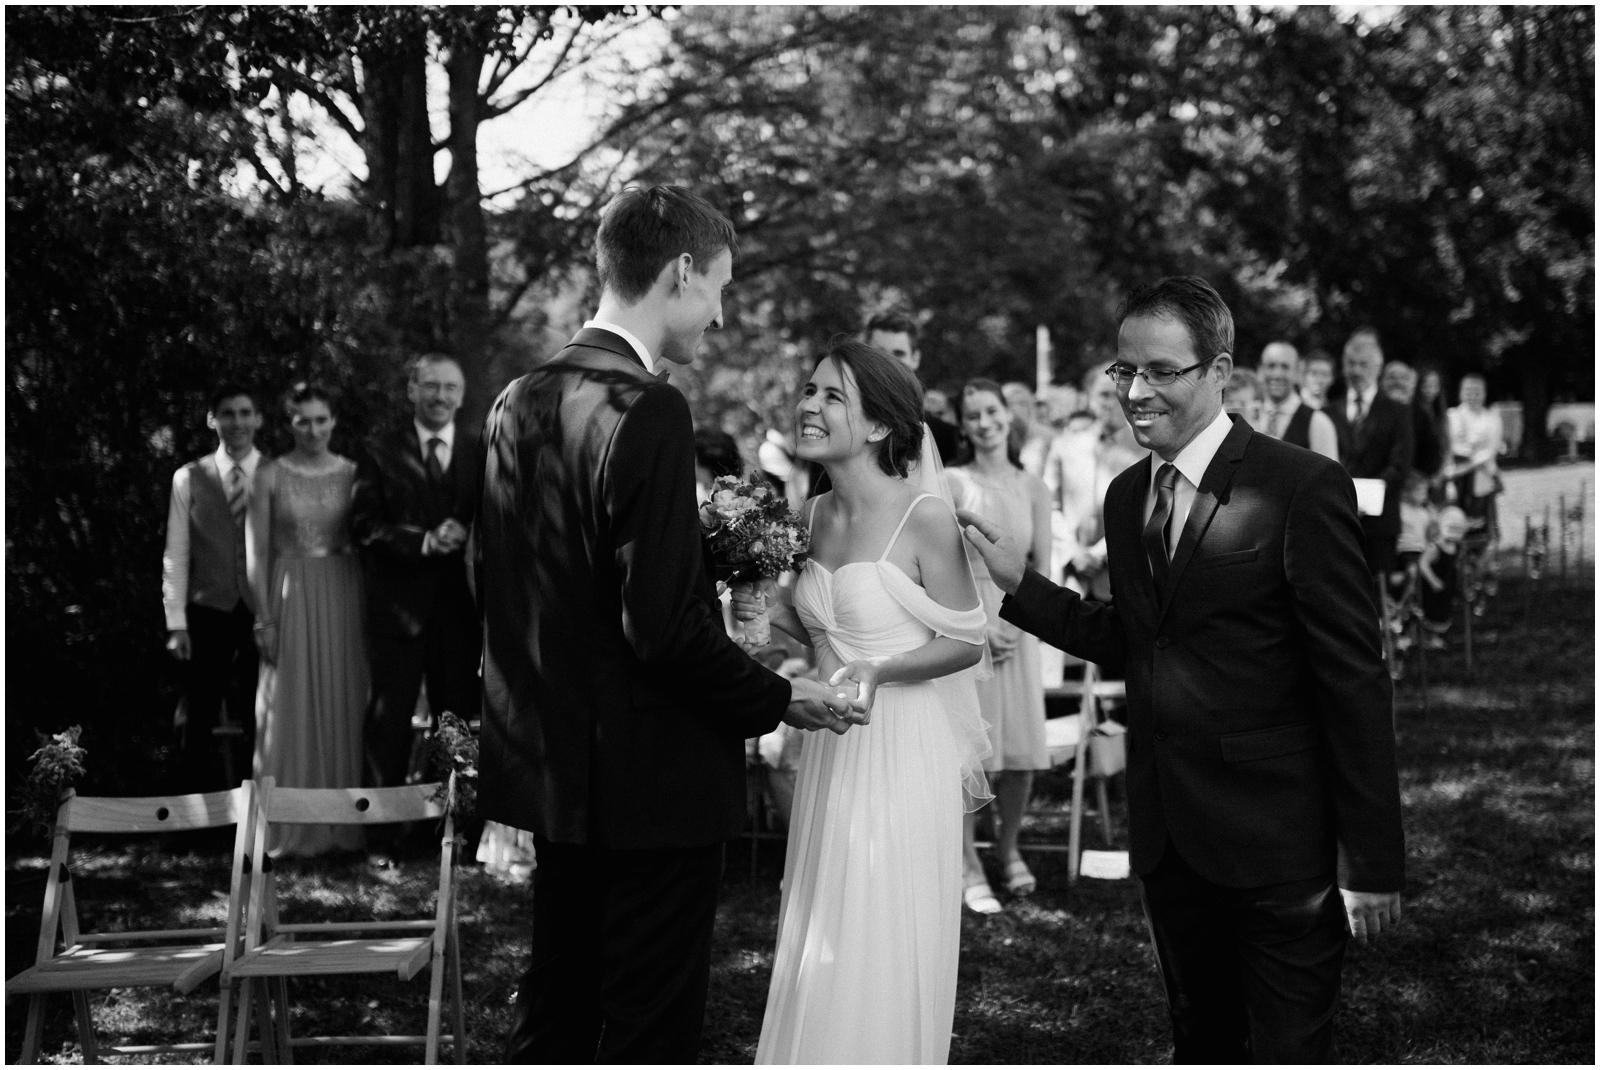 mirjam_thomas_wedding-323-2.jpg